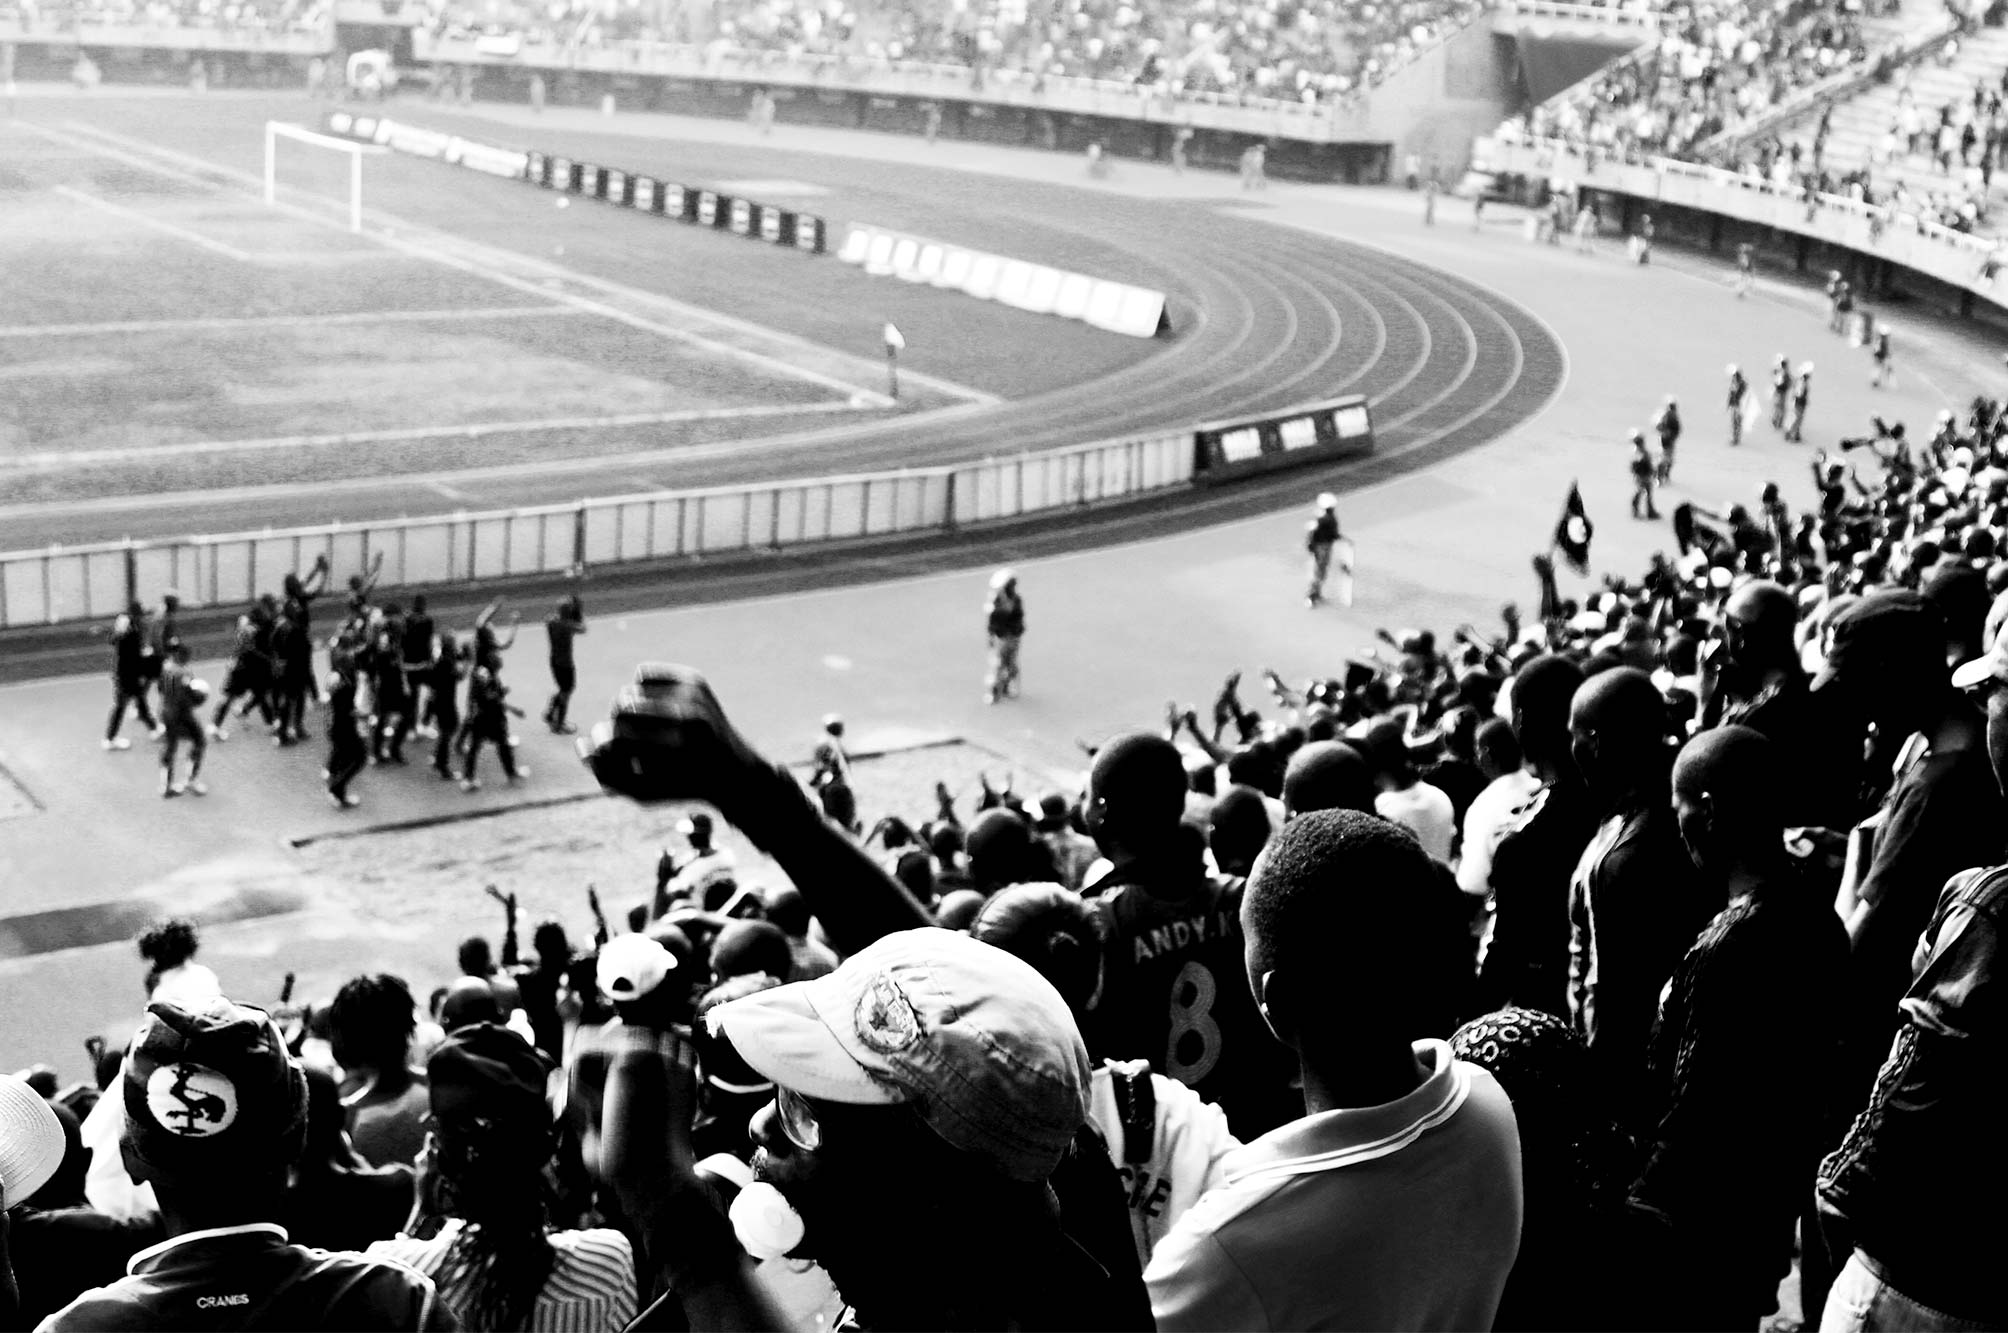 Mandela National Stadium playing football. Uganda winning against Kenya